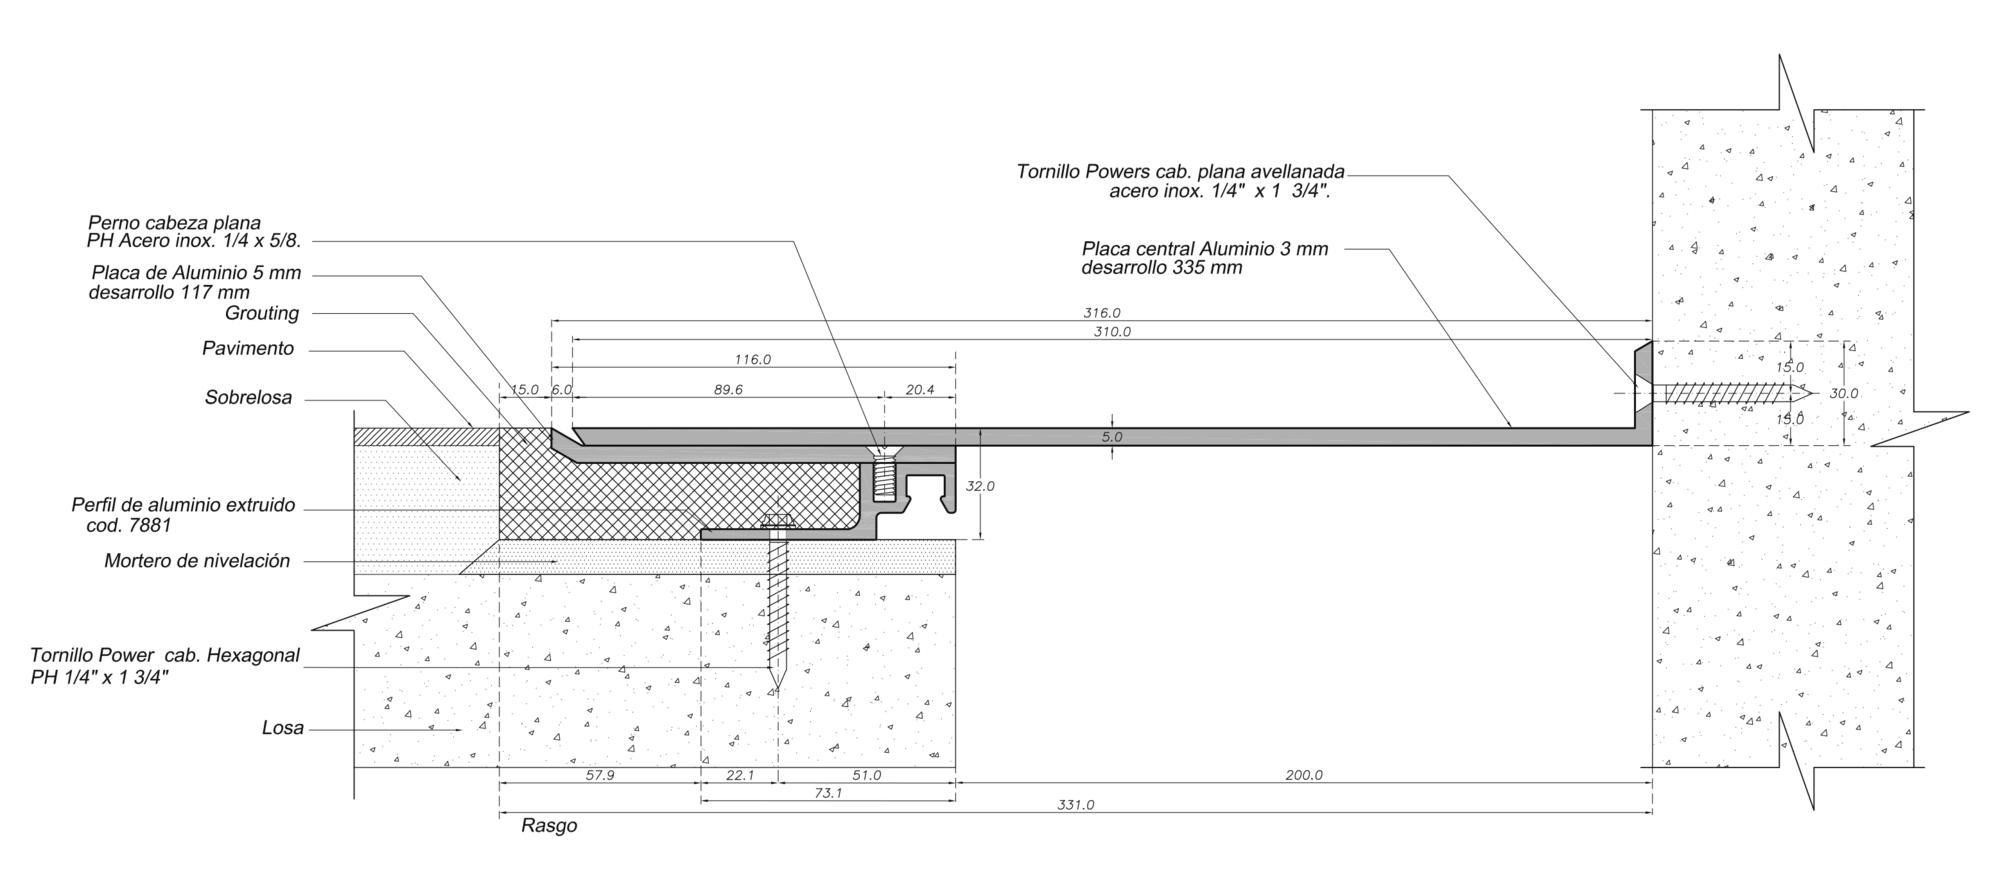 Cubrejunta Piso a Ras Interior Aluminio (CPRIA M) / Sysprotec